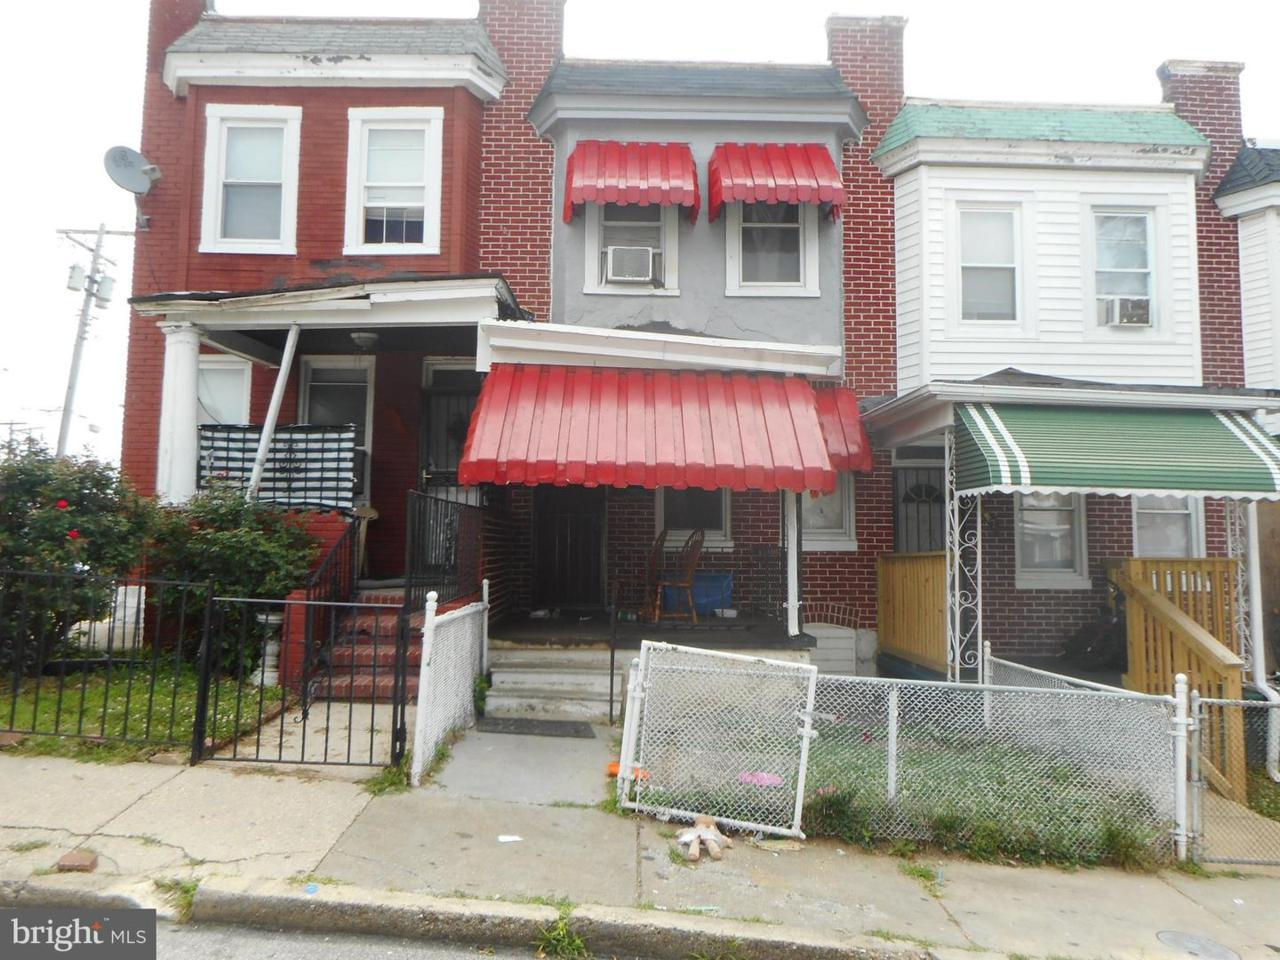 419 Poplar Grove Street - Photo 1